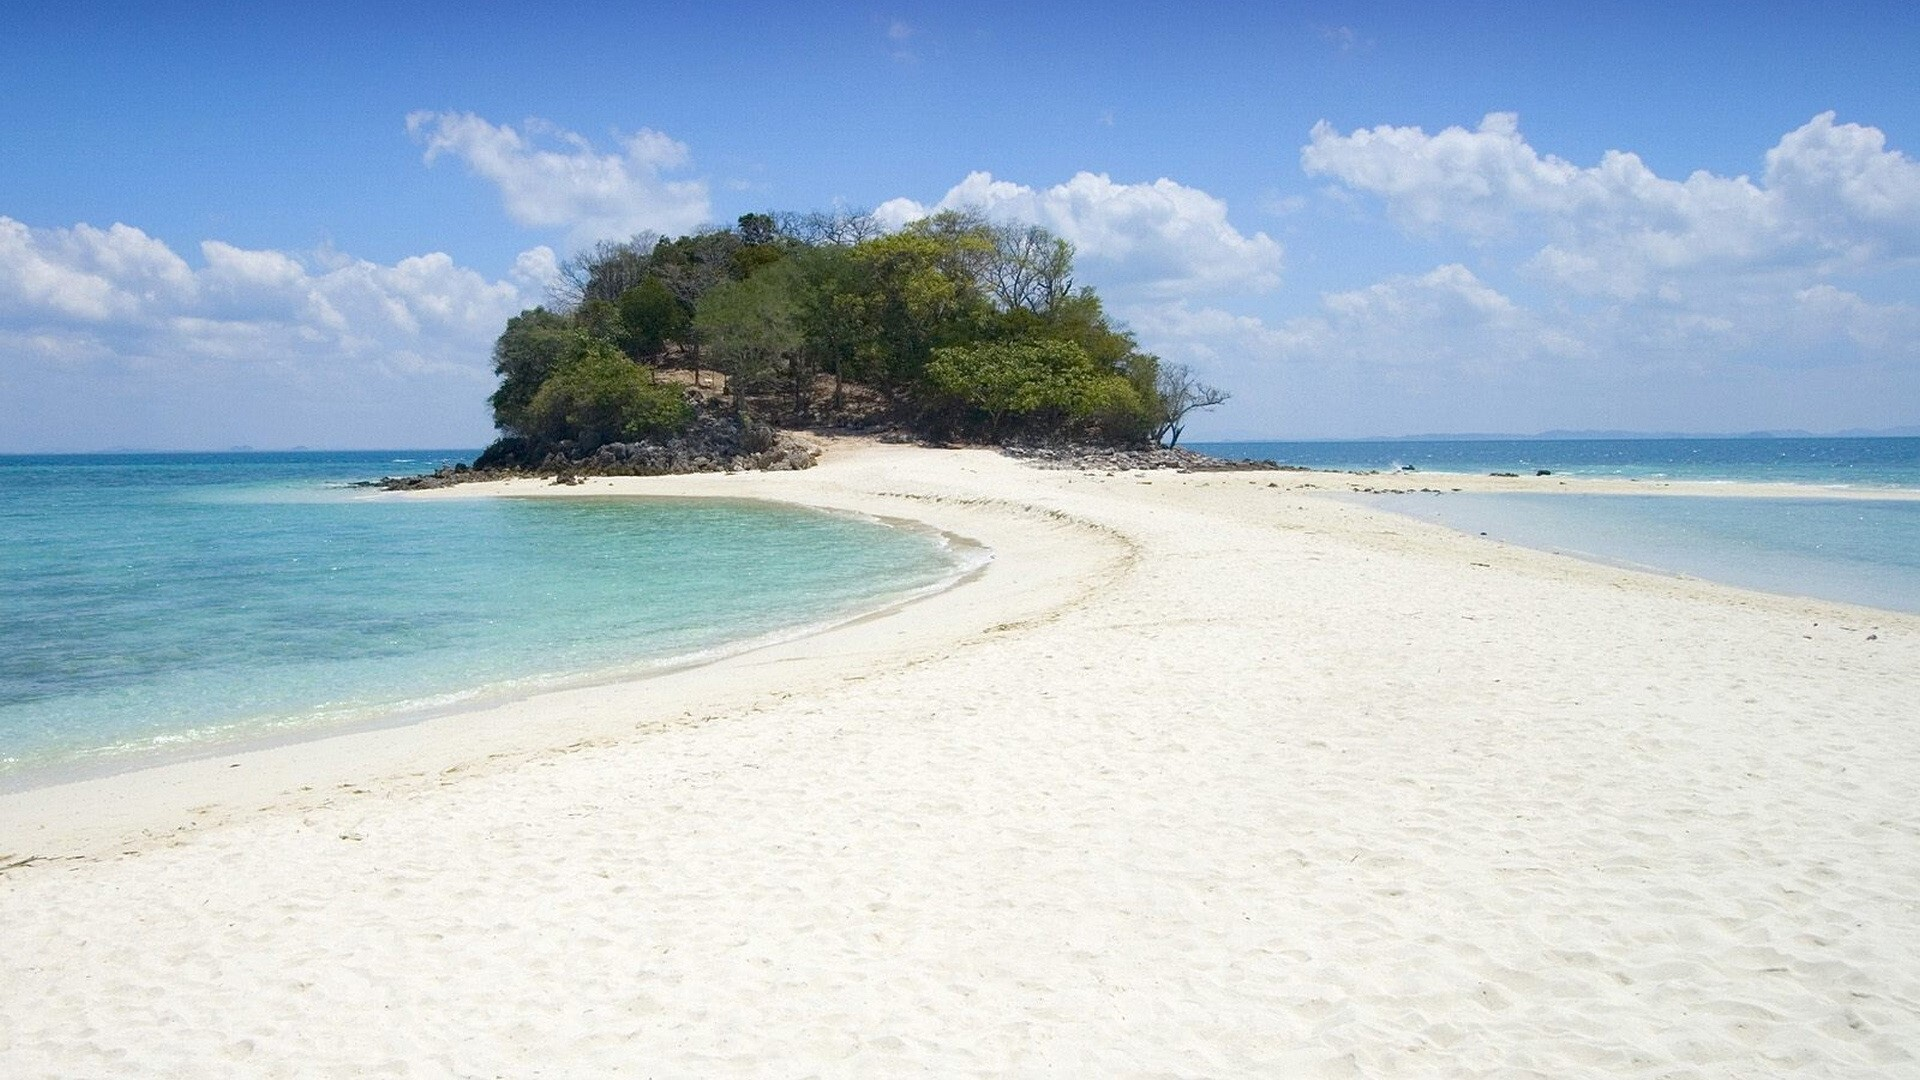 beach wallpapers | free download amazing beautiful hd desktop images